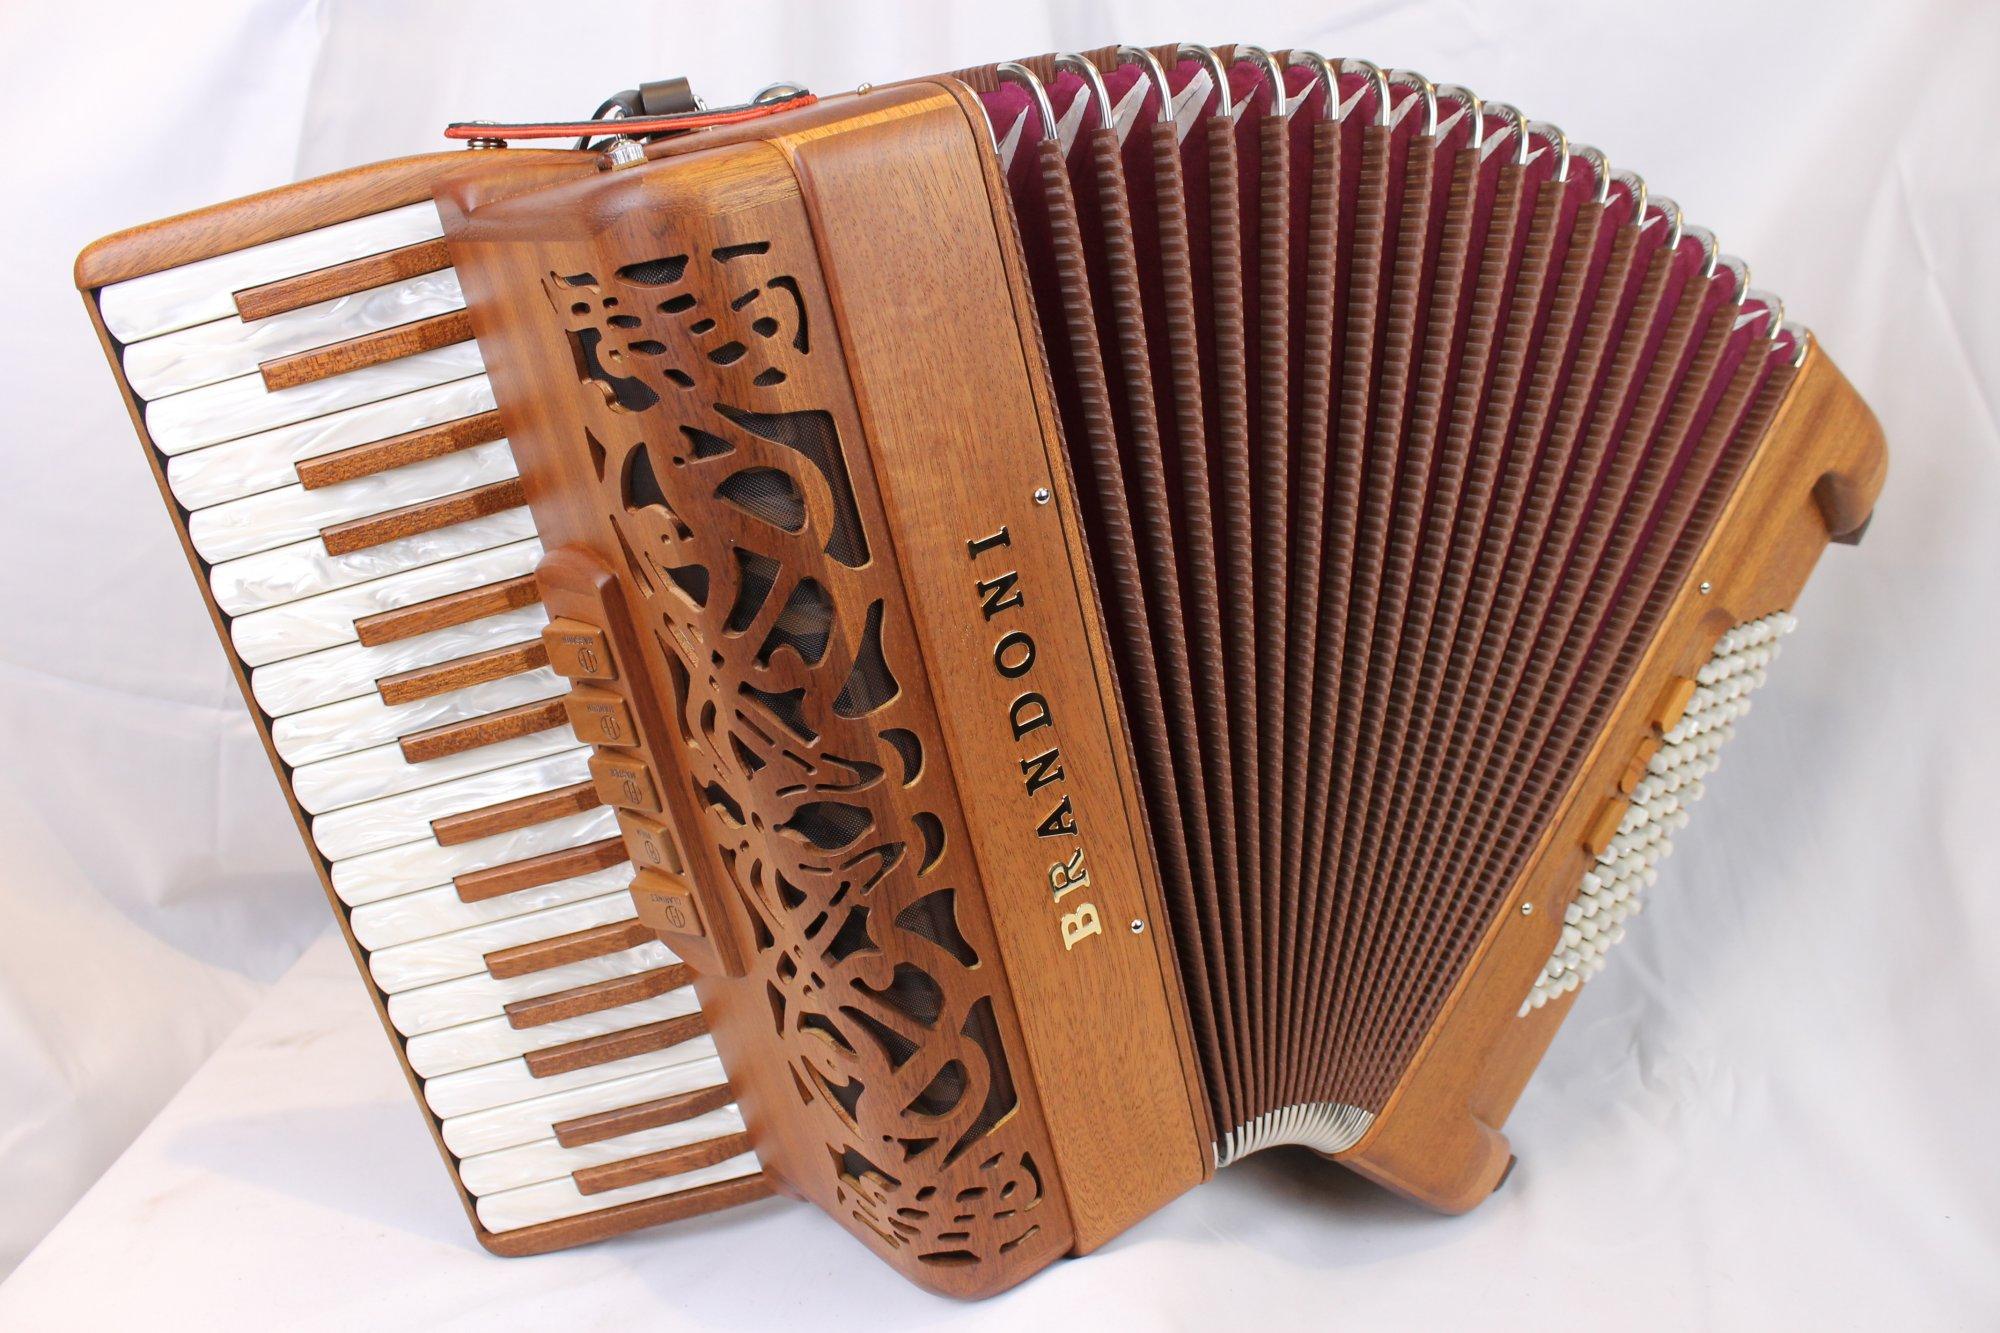 NEW Mahogany Brandoni 66W Piano Accordion LMM 34 78